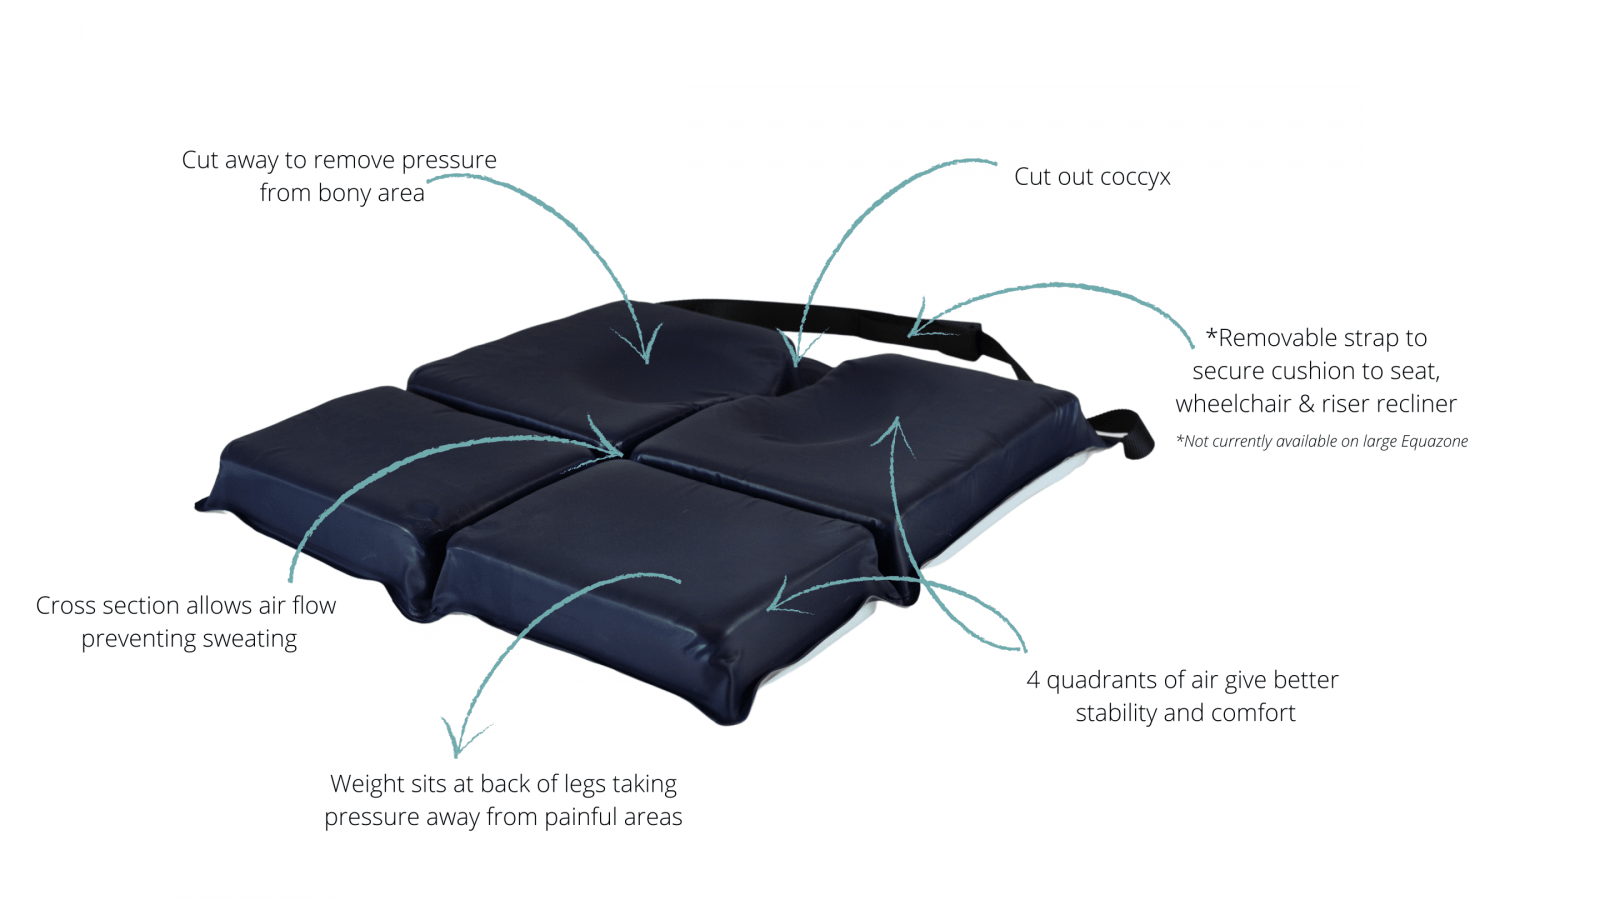 Equazone pressure cushion.  Instant air cushion for pressure care